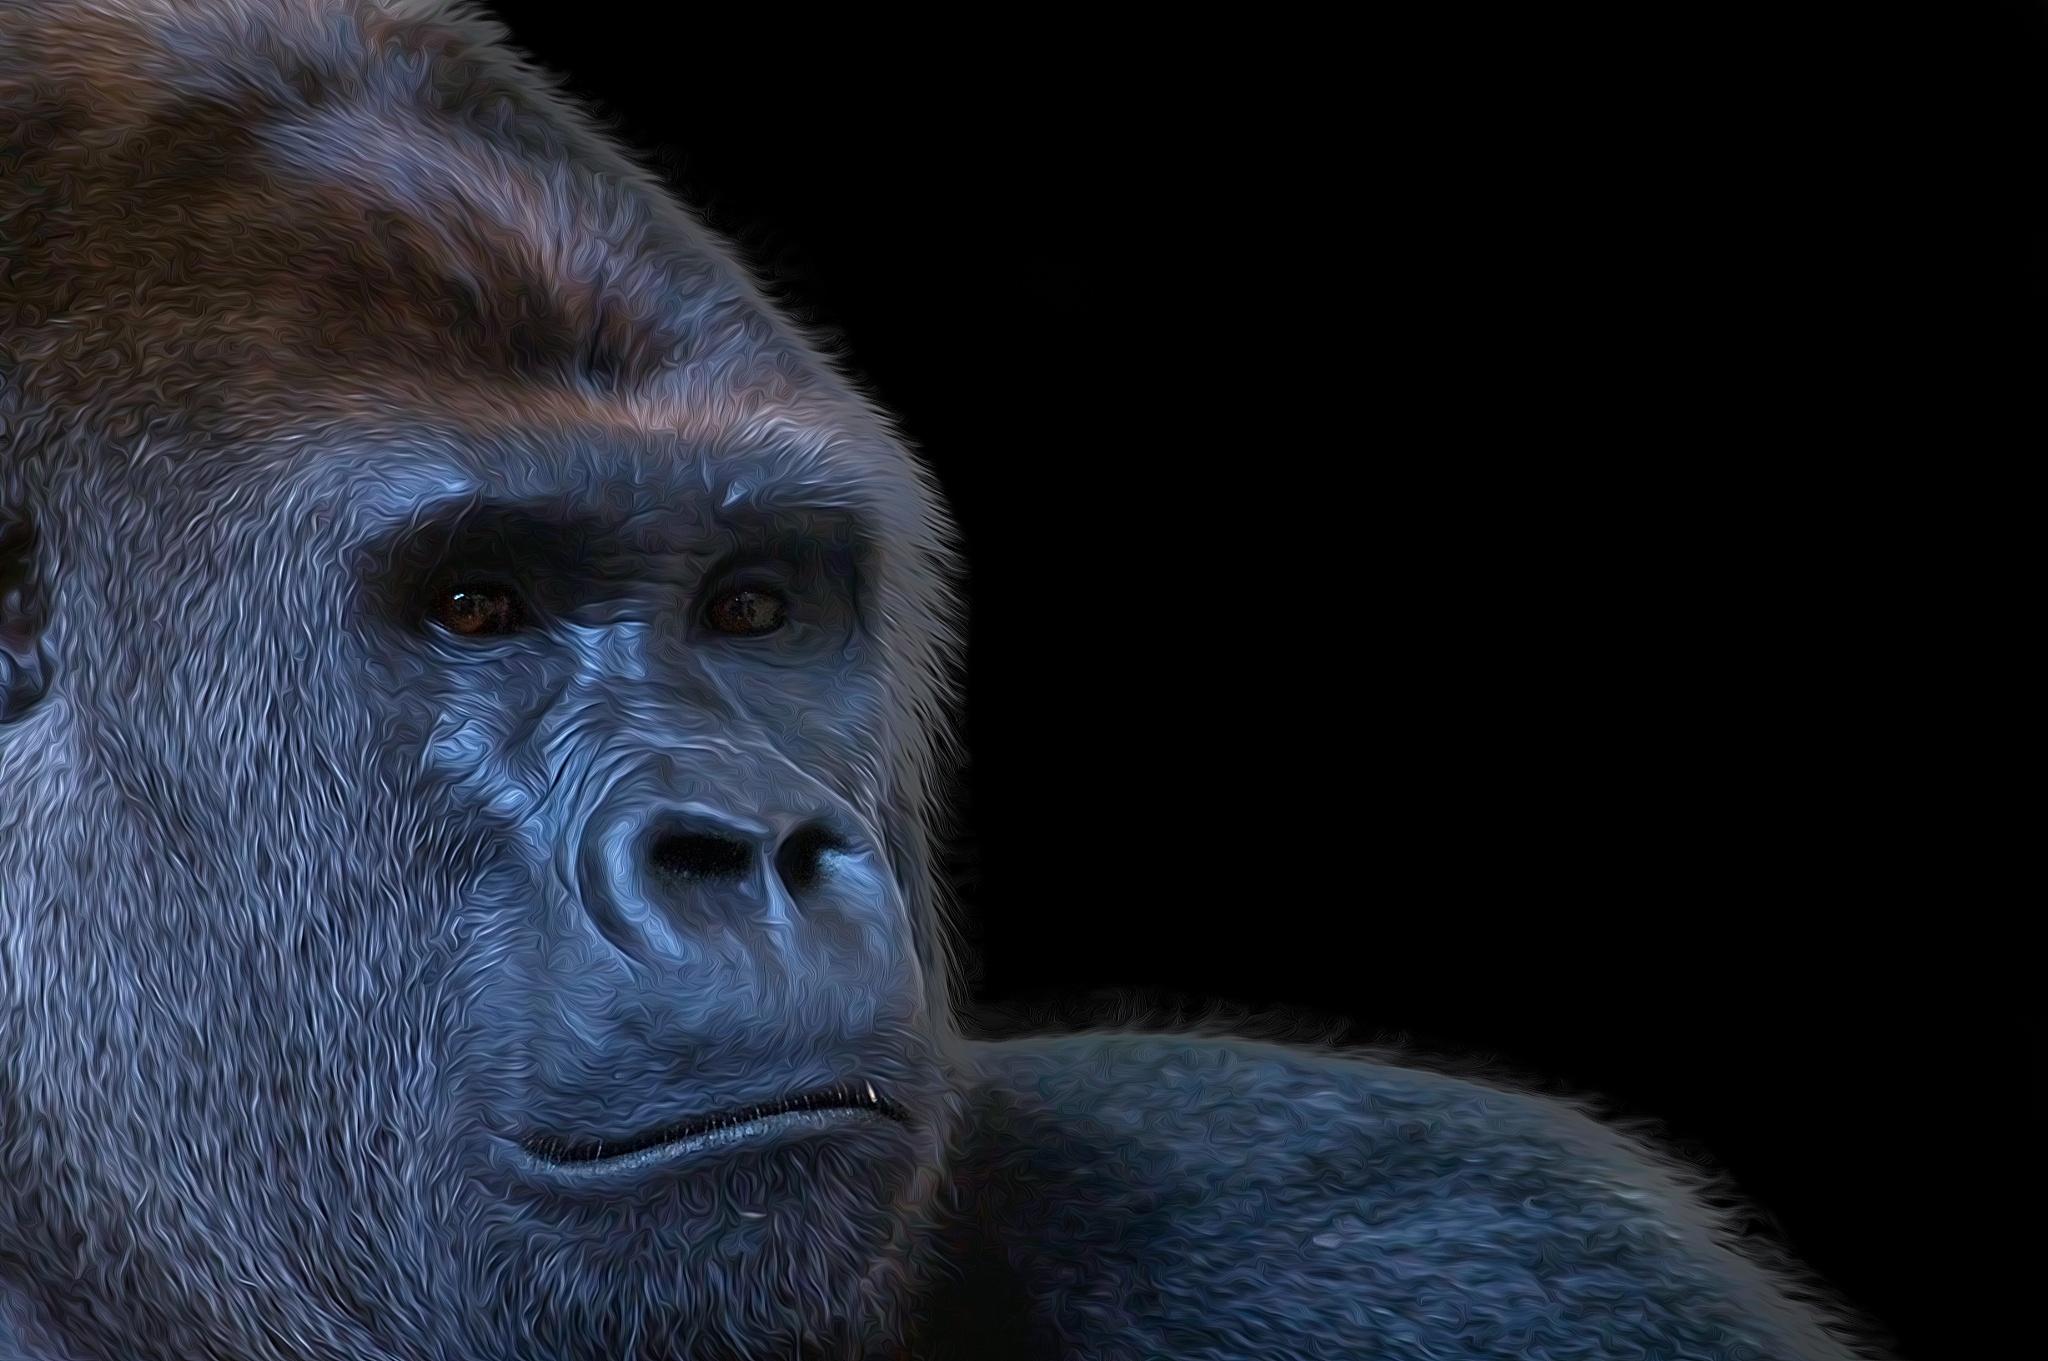 Gorilla by Mustafa Celebi